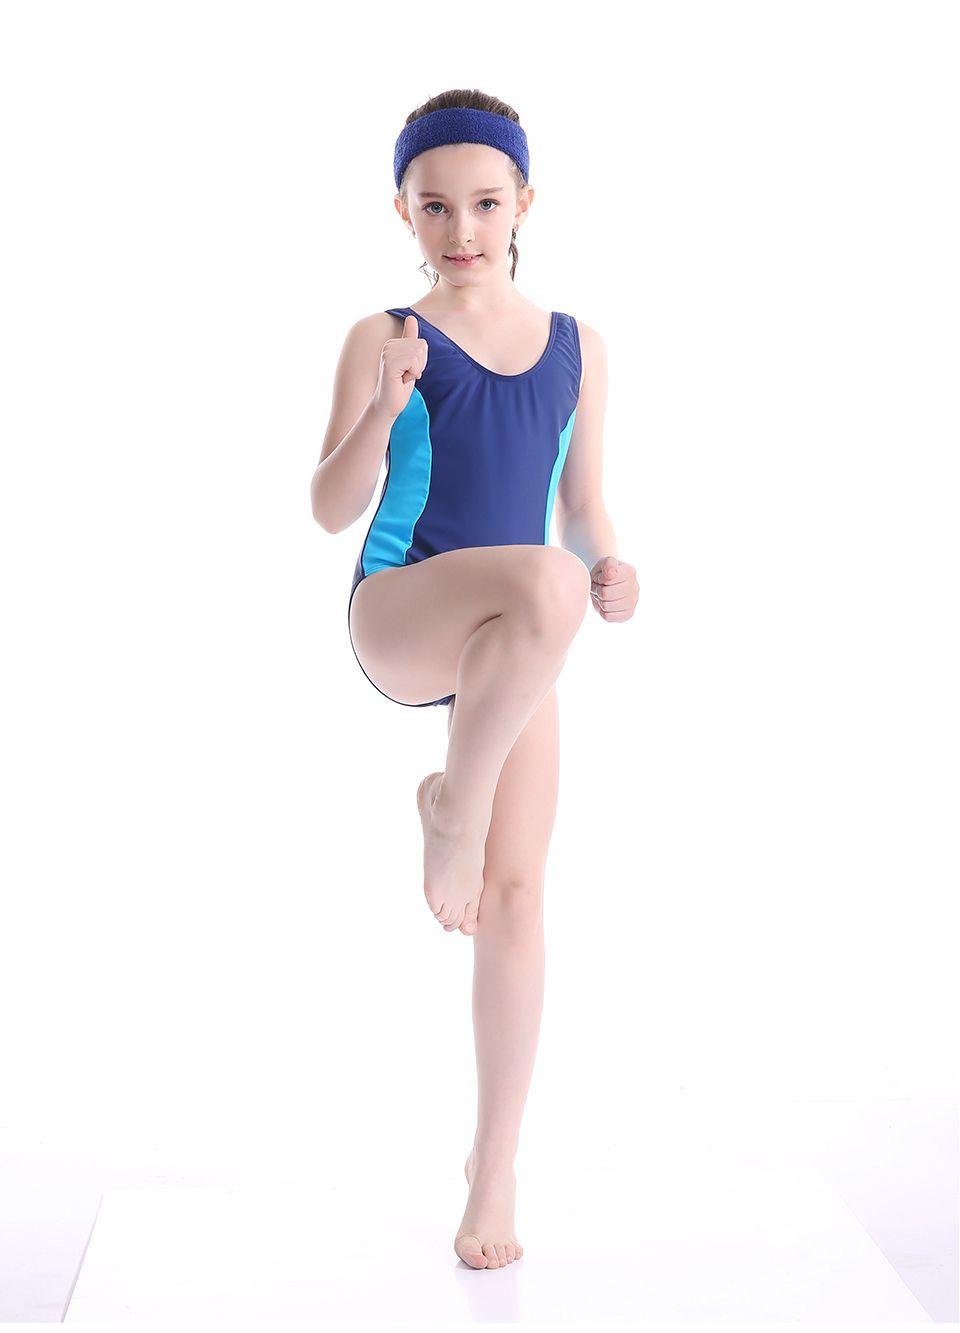 bikinis 2019 mujer Children Swimwear Girls One-piece Sport Swimsuit Kids Professional Swimsuit Beach Wear Bathing Suit thong set